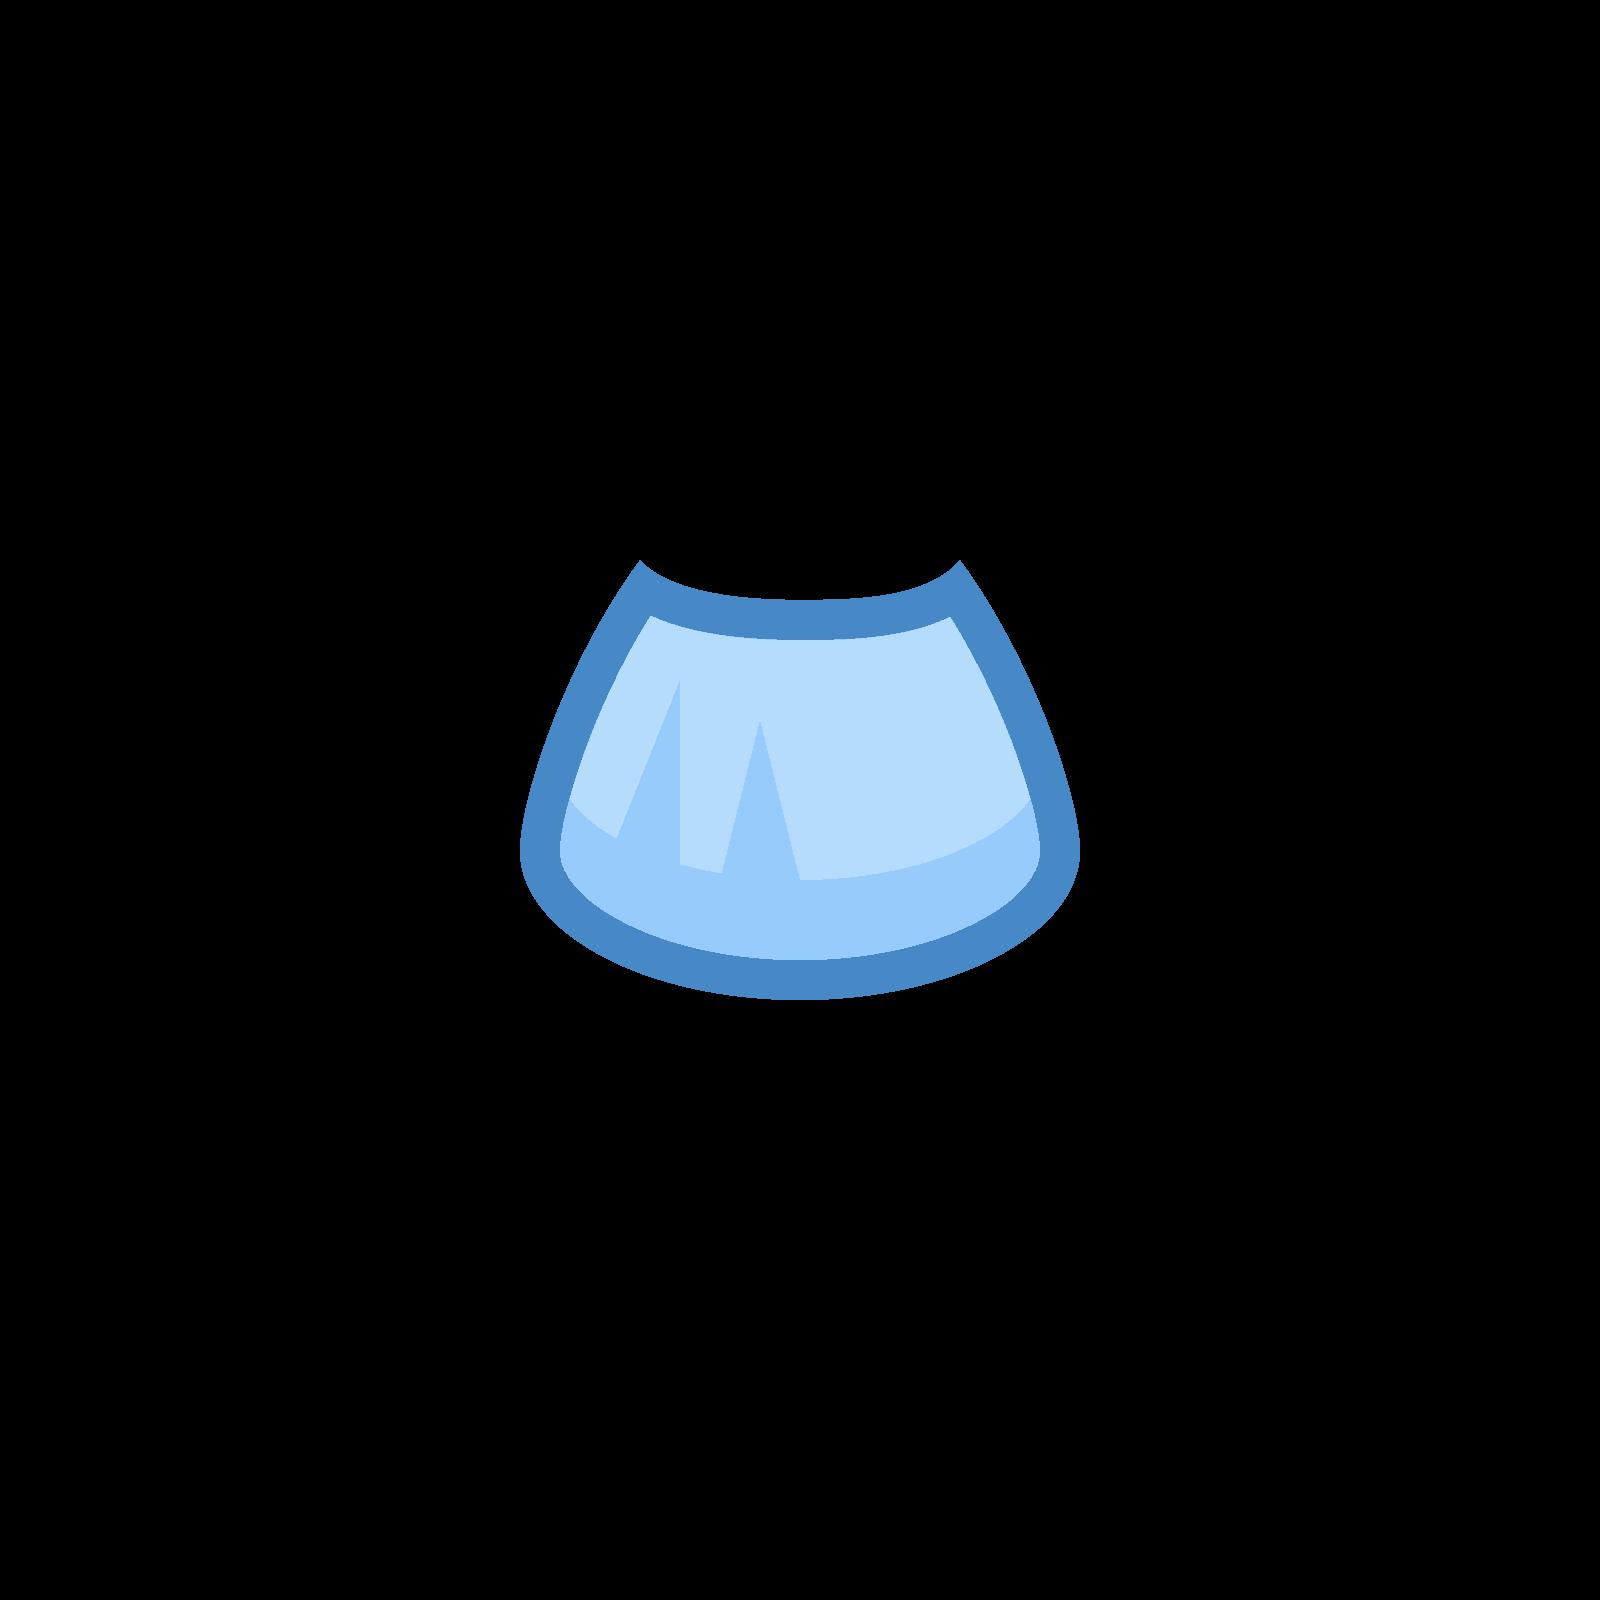 Chaplin icon kostenloser download. Clipart mustache light blue